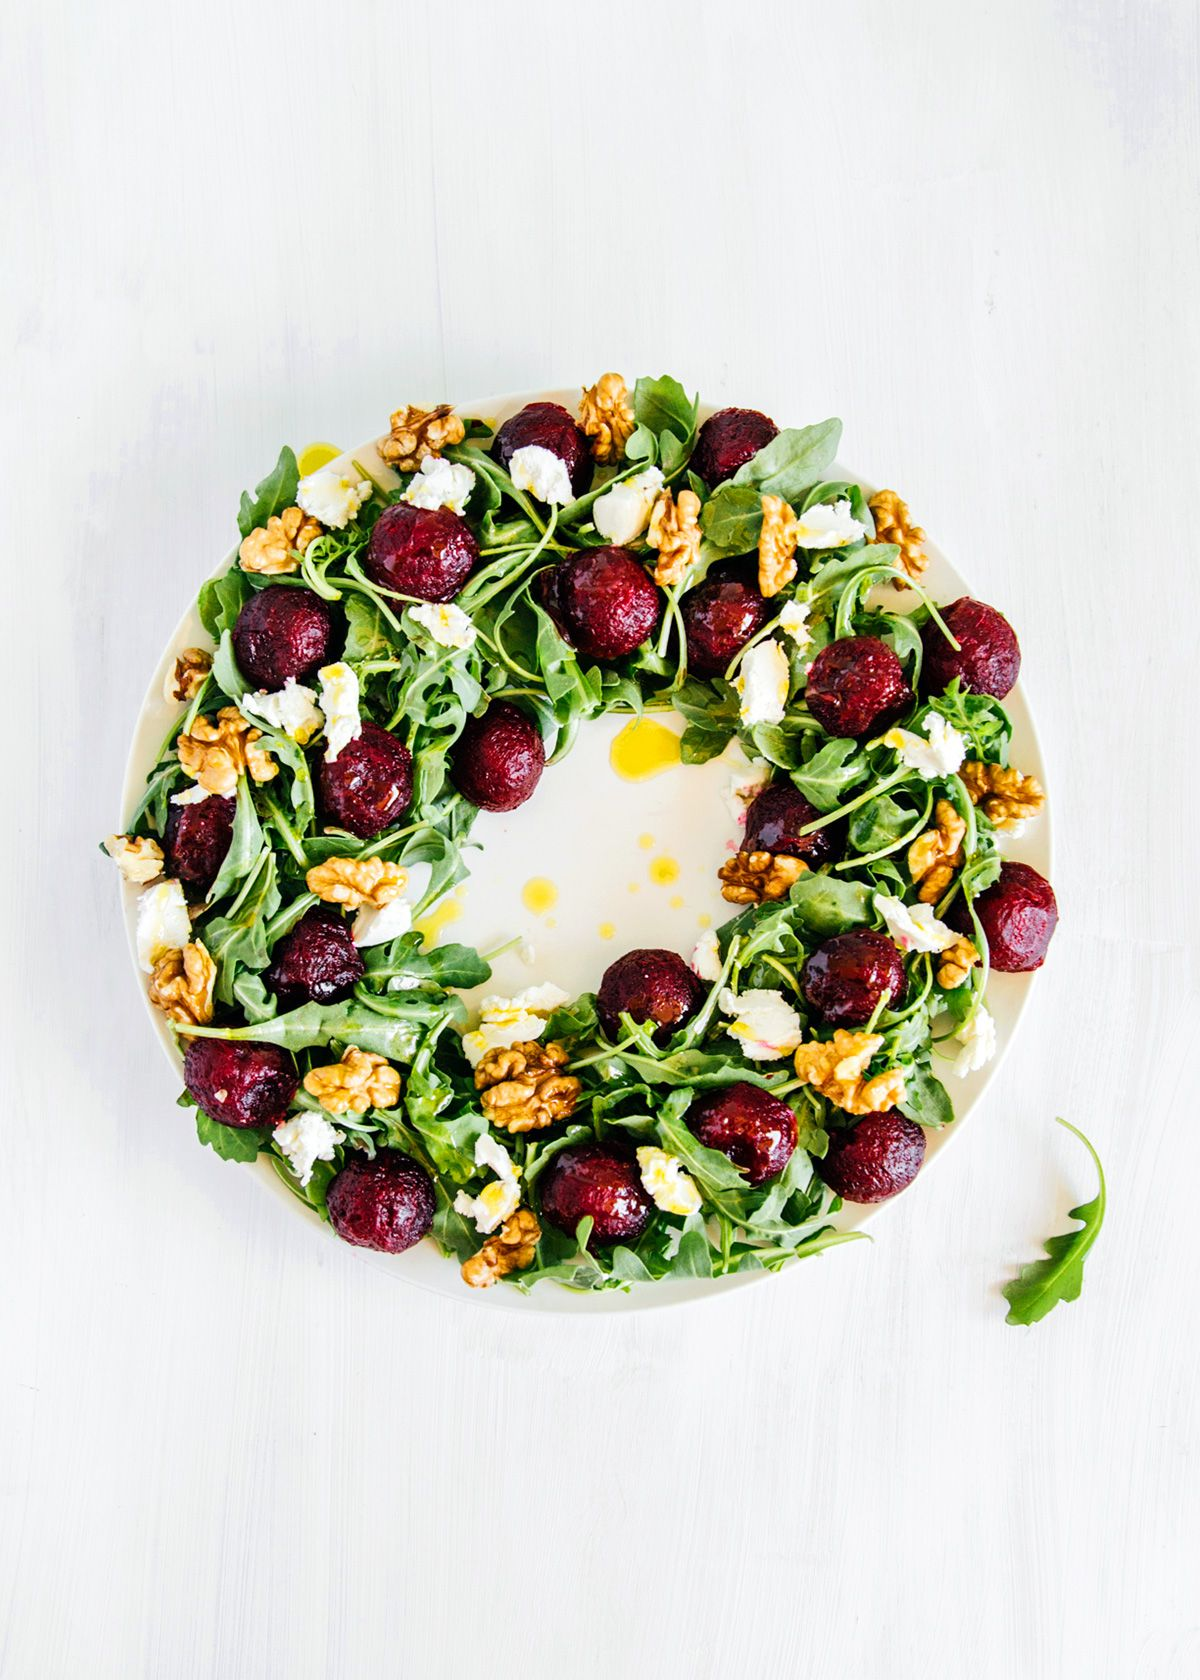 Christmas Wreath Salad  Beet, Goat Cheese, Rocket And Walnut –